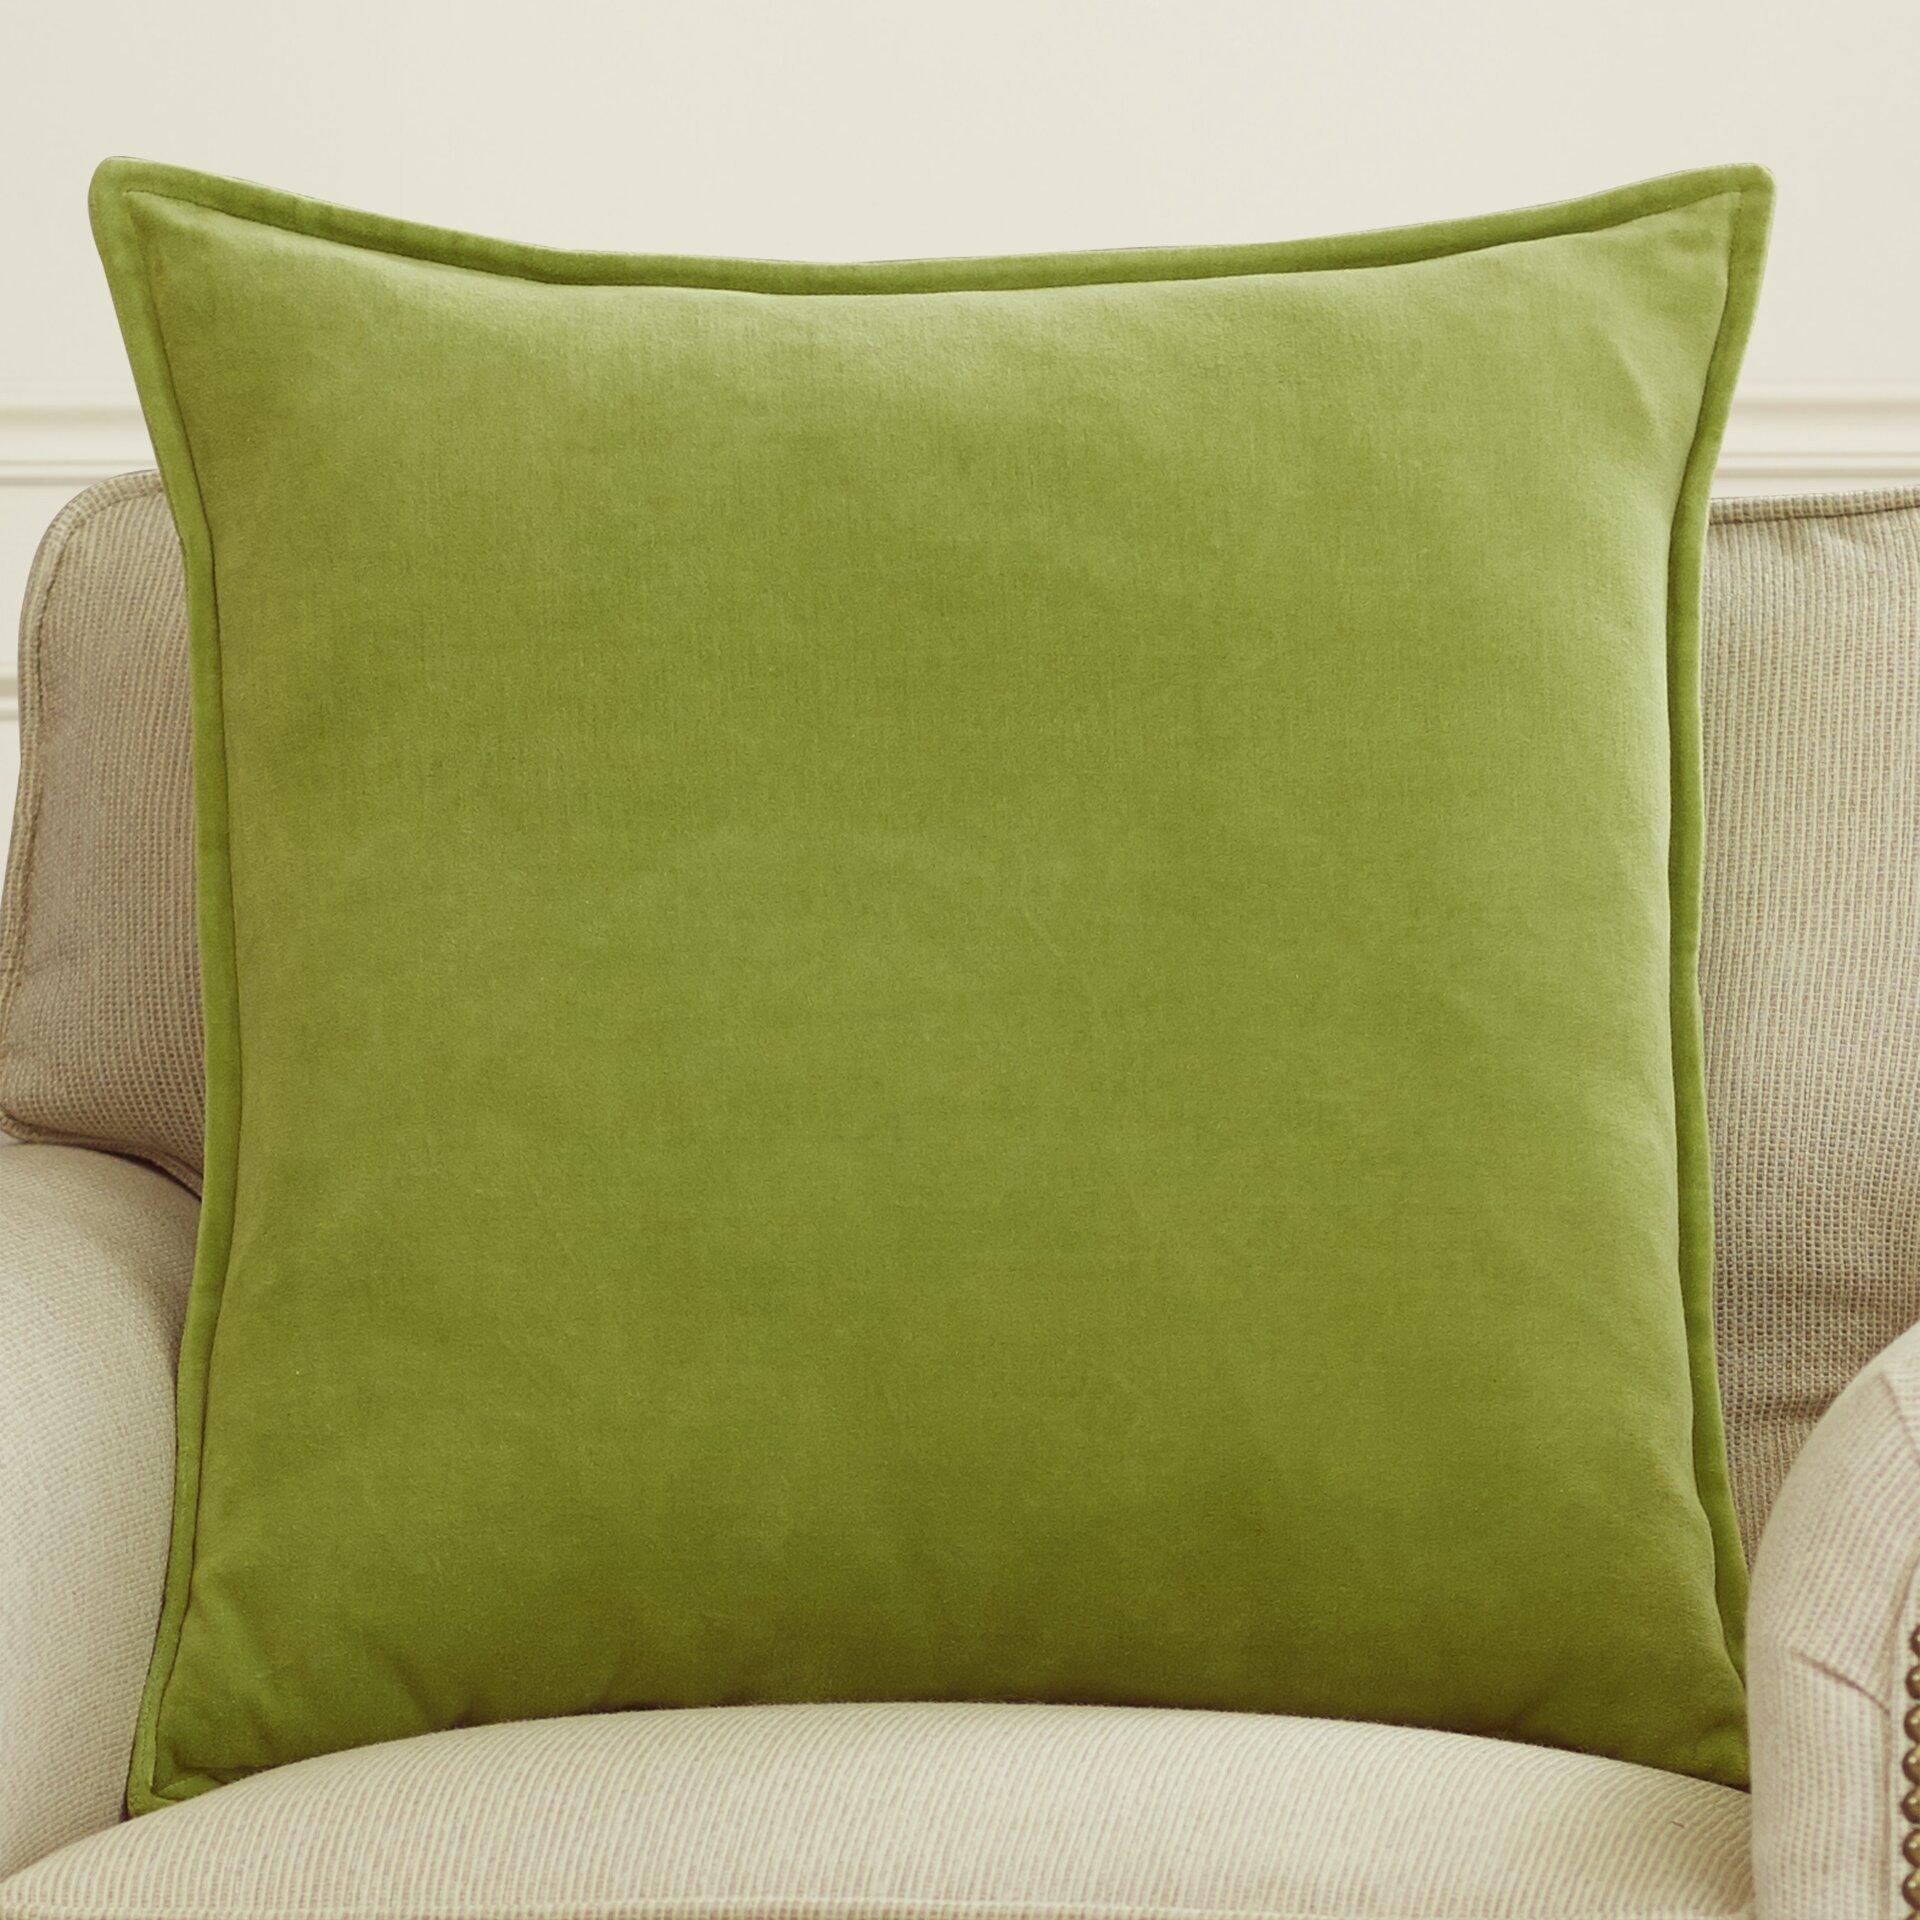 Cotton Velvet Decorative Pillows : House of Hampton Askern Smooth Velvet Cotton Throw Pillow & Reviews Wayfair